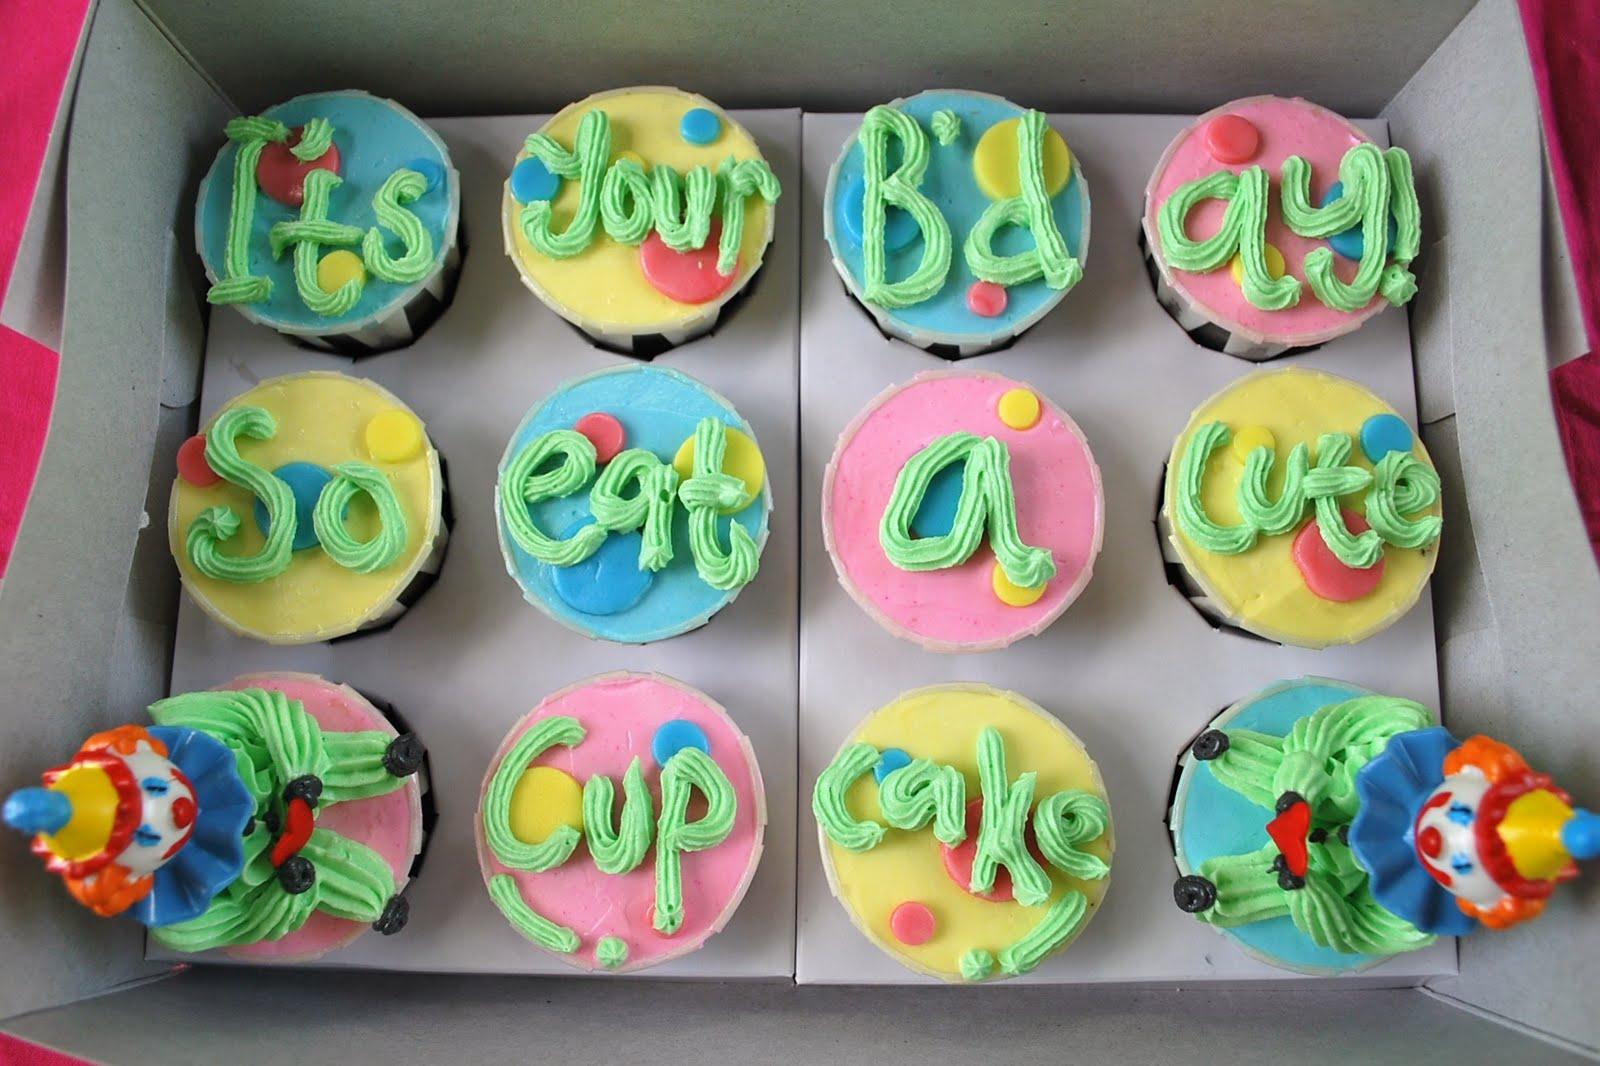 boyfriend cupcakes - photo #40